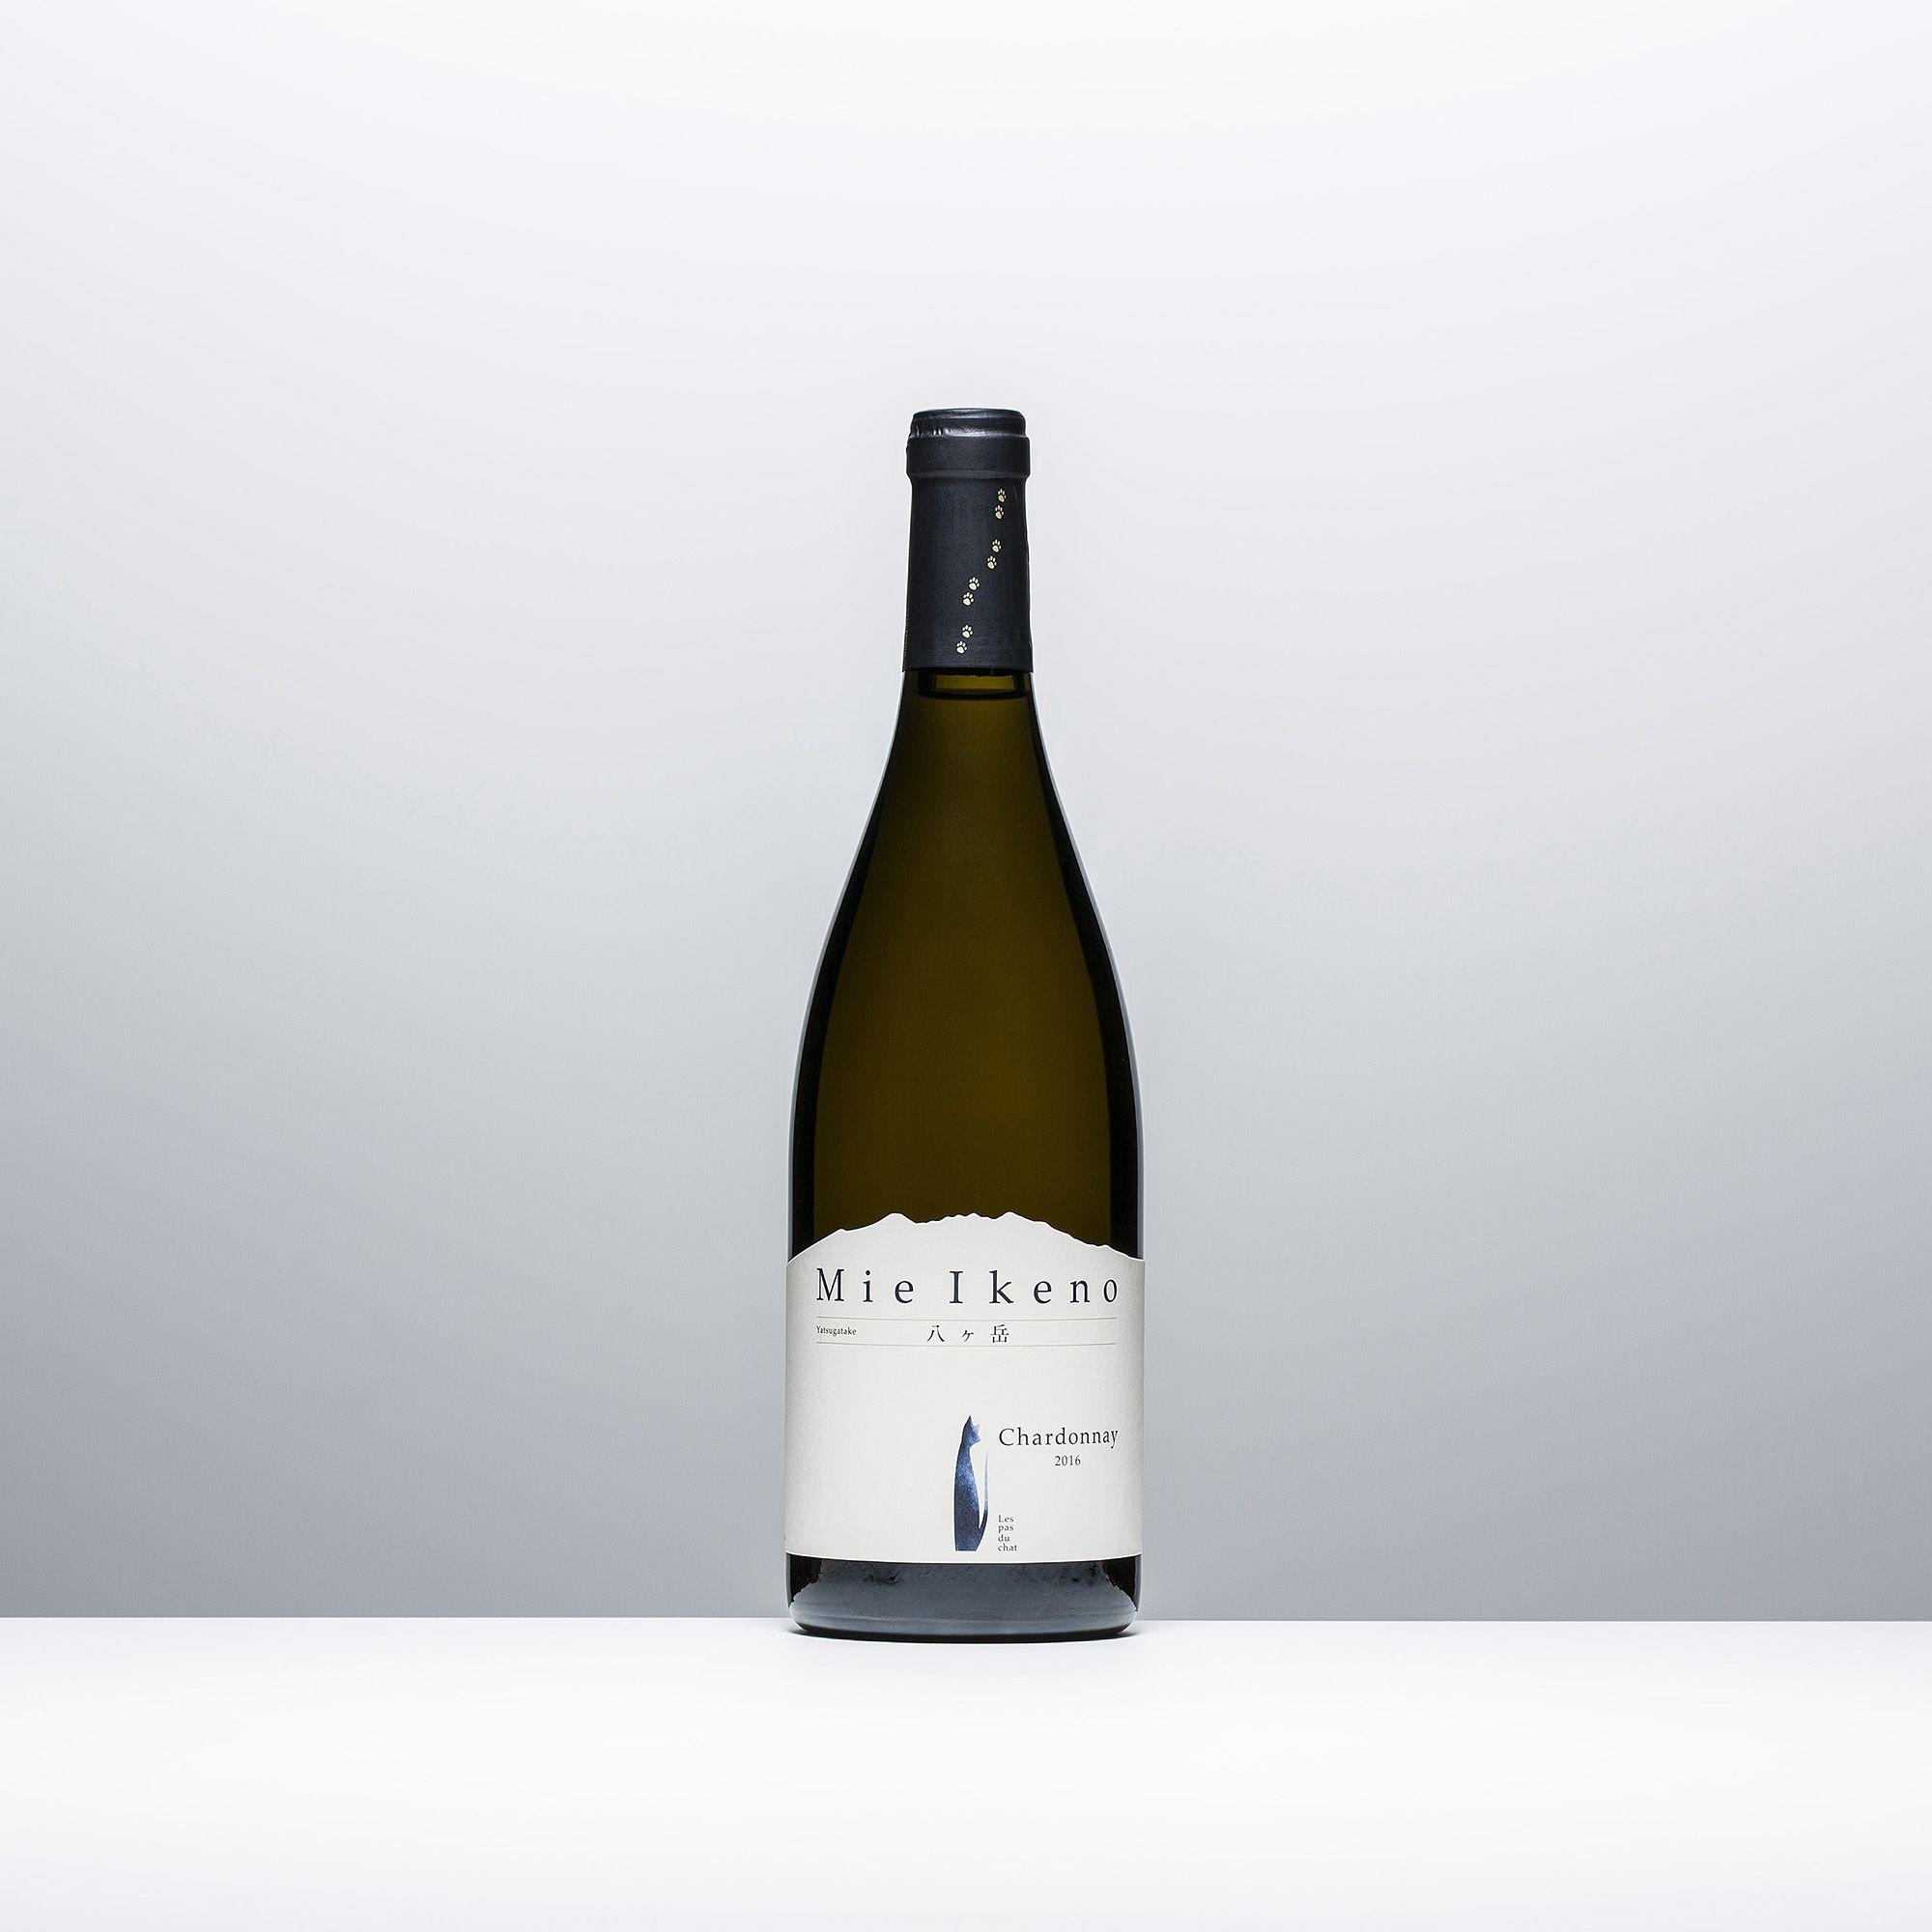 Mie Ikeno, Chardonnay 2016